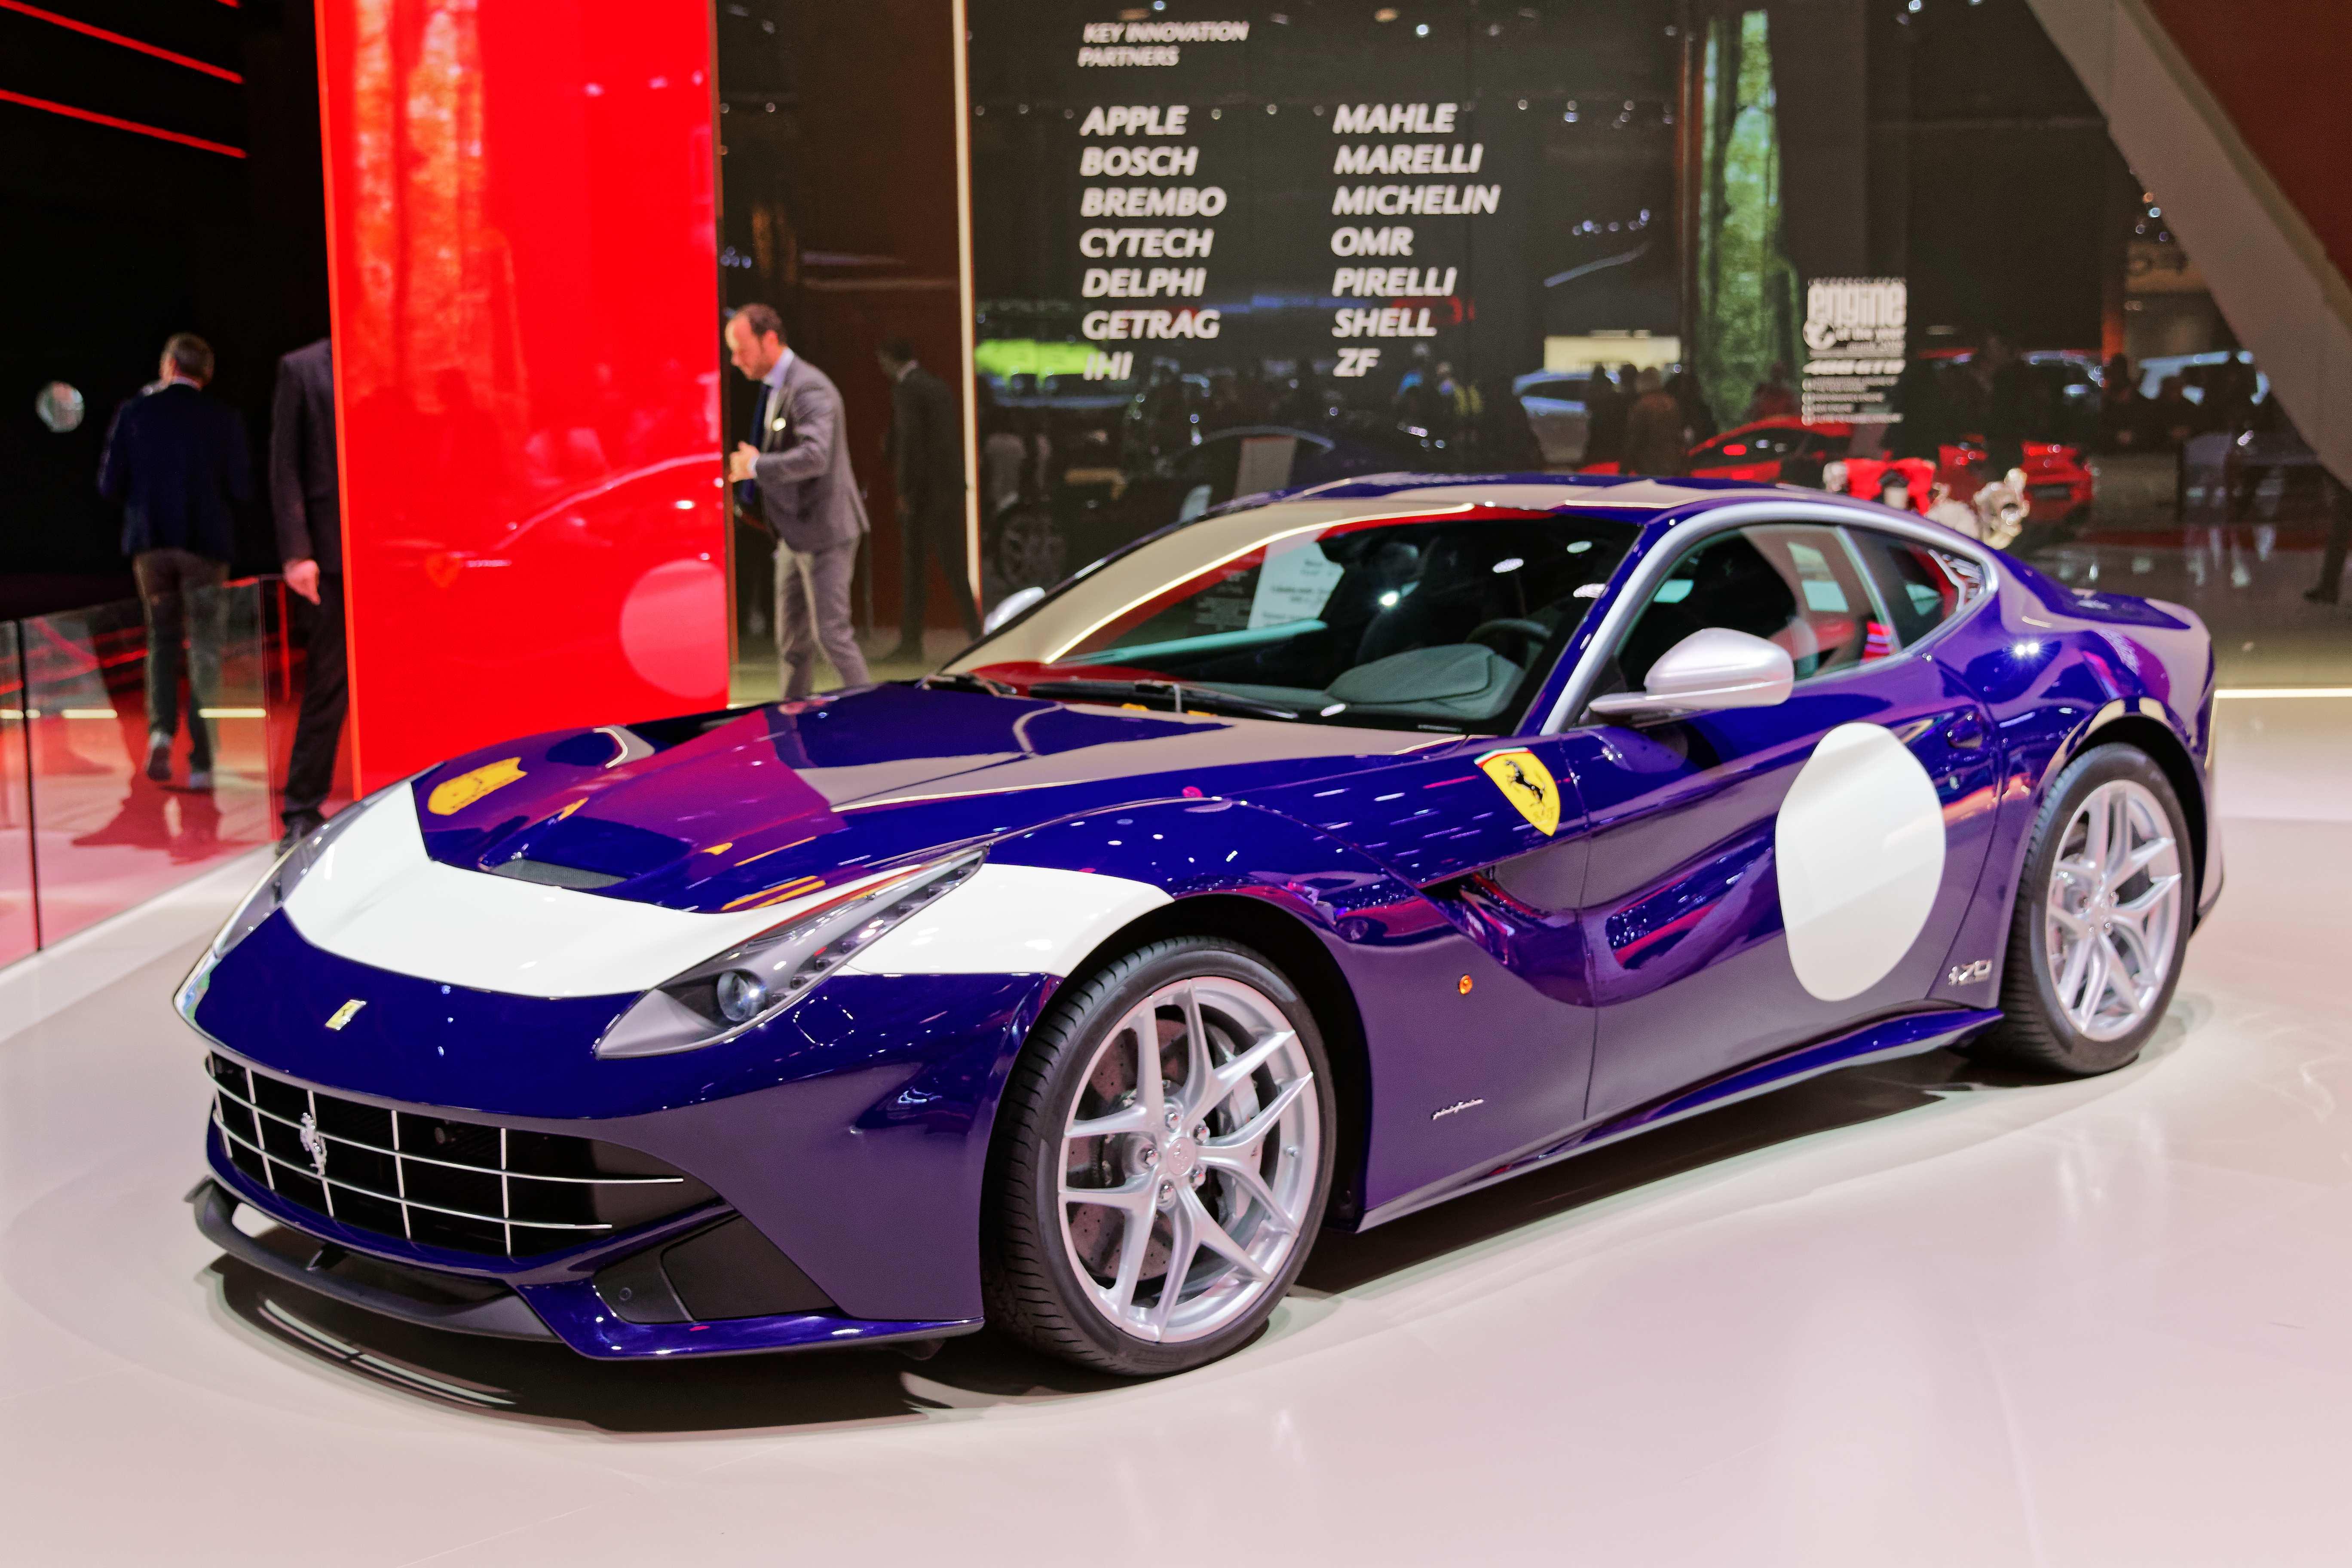 25 Concept of 2019 Ferrari Key Release Date Exterior for 2019 Ferrari Key Release Date